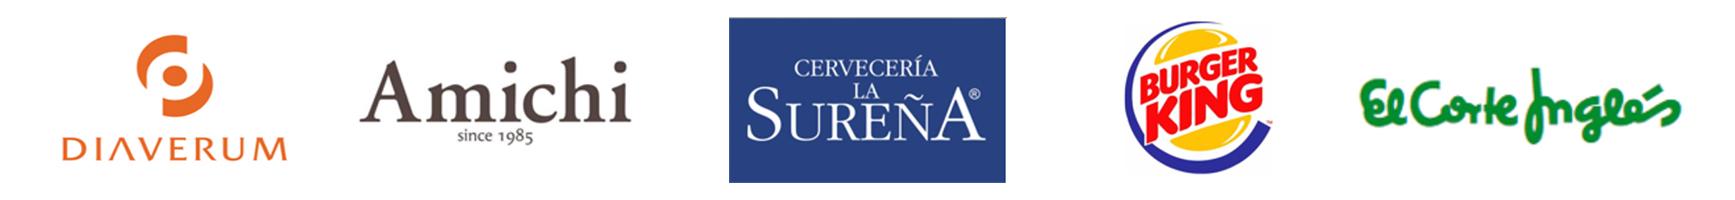 Logotipo, Clientes, Ofiberia, Obras, Empresa, Profesional,